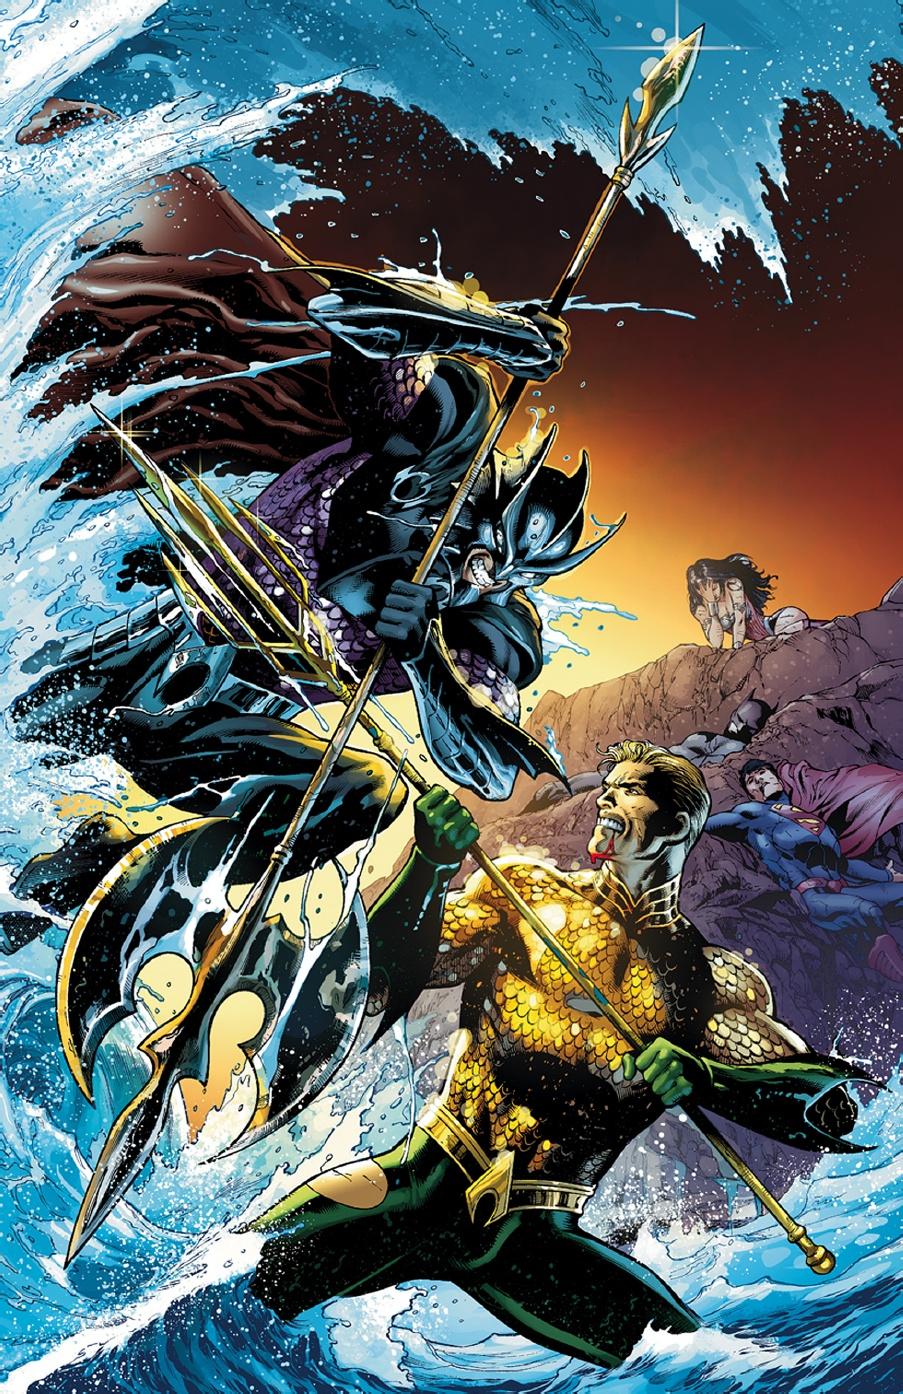 Justice League/Aquaman crossover for THRONE OF ATLANTIS